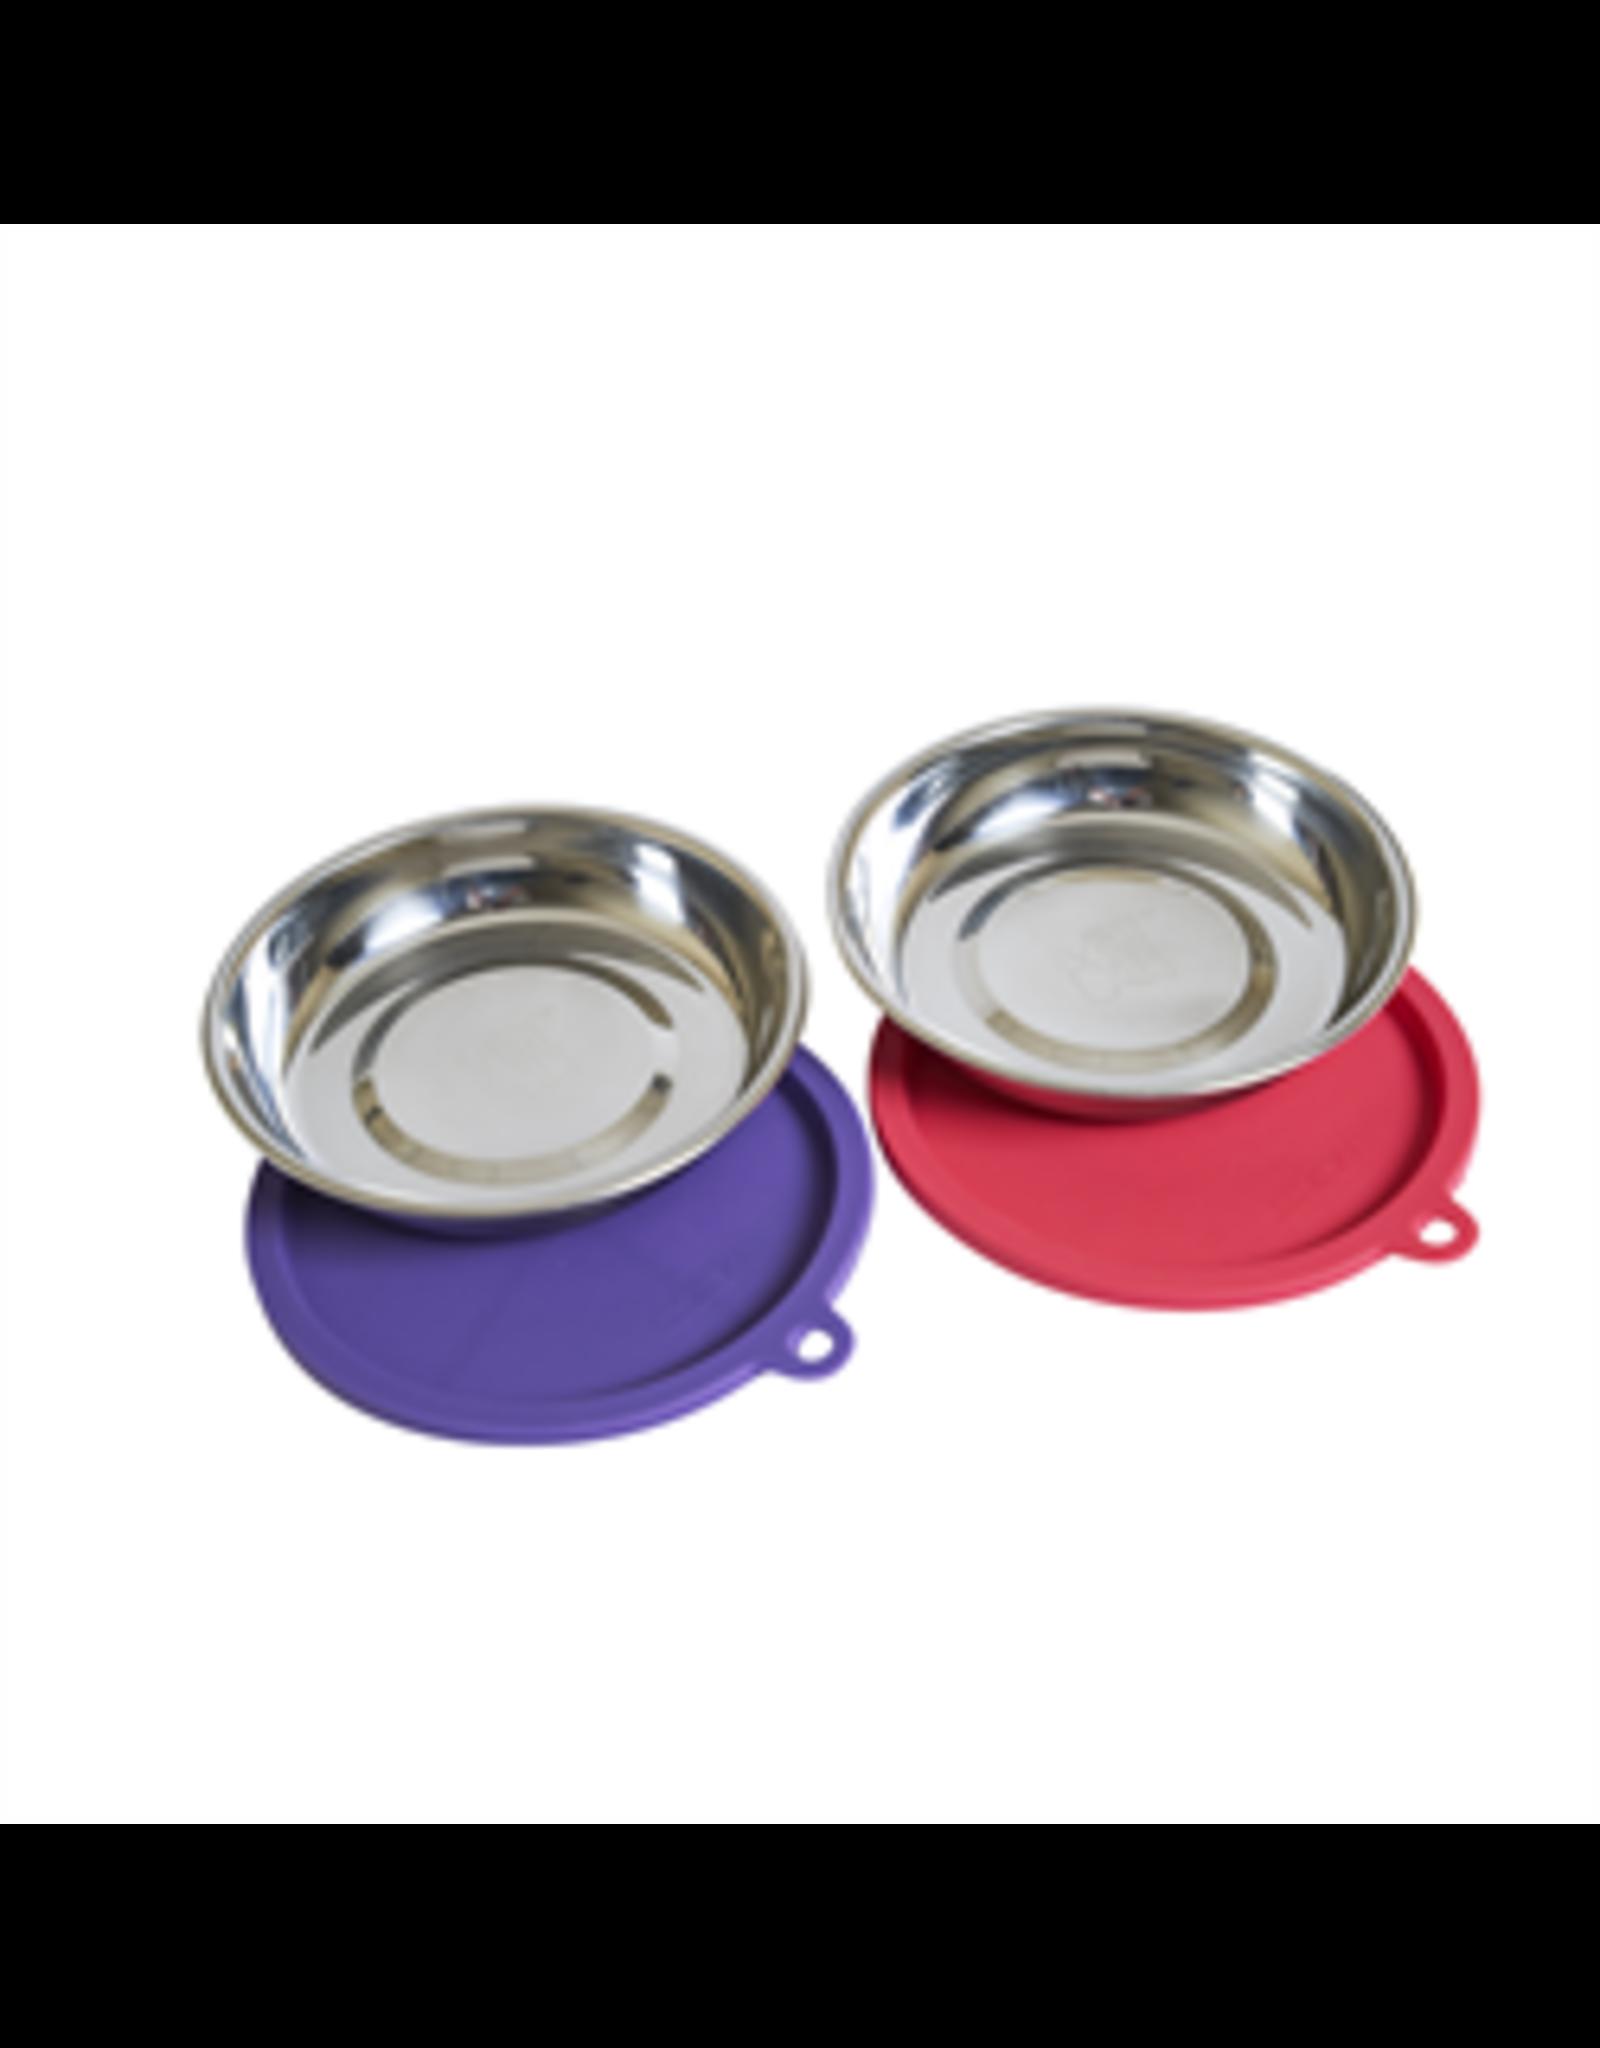 MessyCats MessyCats - 4pc Set - StainlessSaucerBowls w. Lids - Watermelon/Purple